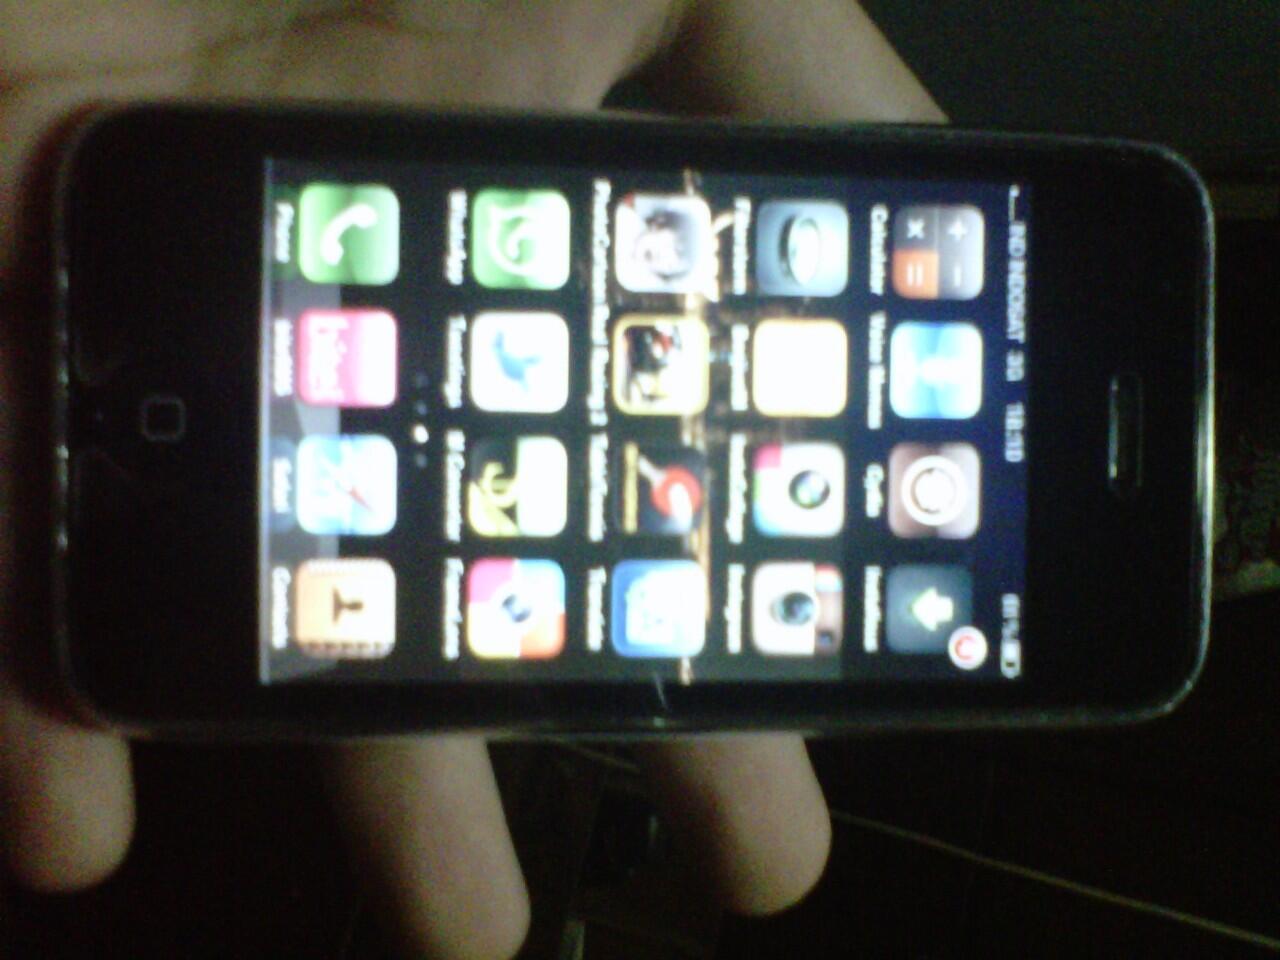 Iphone 3G 16 GB OS 4.2.1 Jailbreak